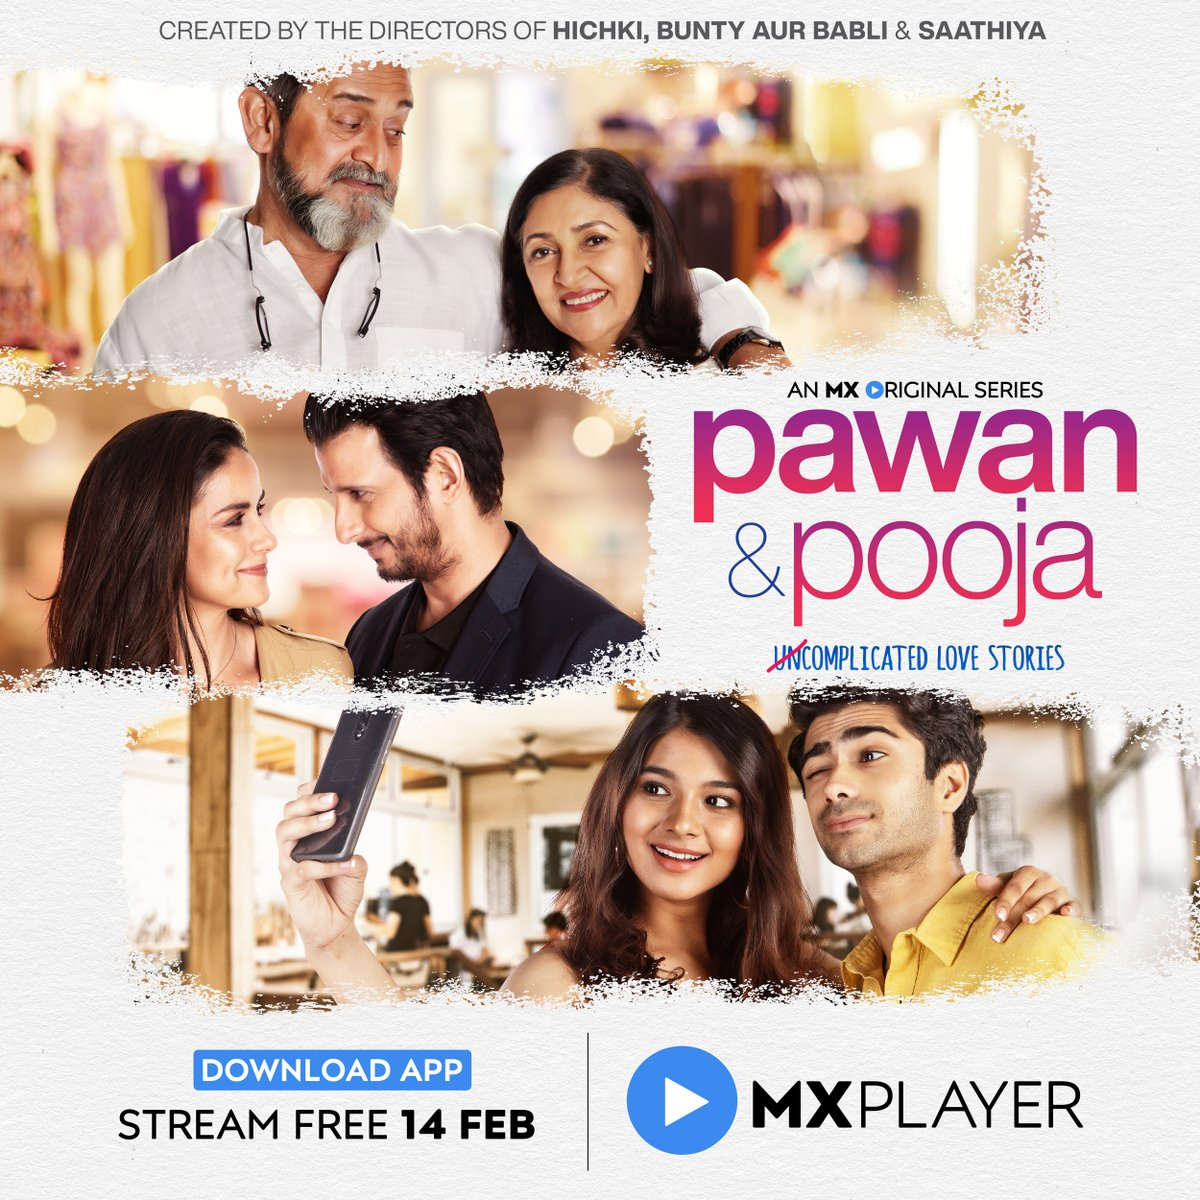 #ContestAlert:  When is the series Pawan & Pooja releasing on? A) 14th February   B) 15th February   Win free Amazon vouchers for Pawan & Pooja. #Glamsham #PawanAndPooja #MXOriginalSeries @TheSharmanJoshi @mxplayer Rules: Follow http://glamsham.com T&C apply